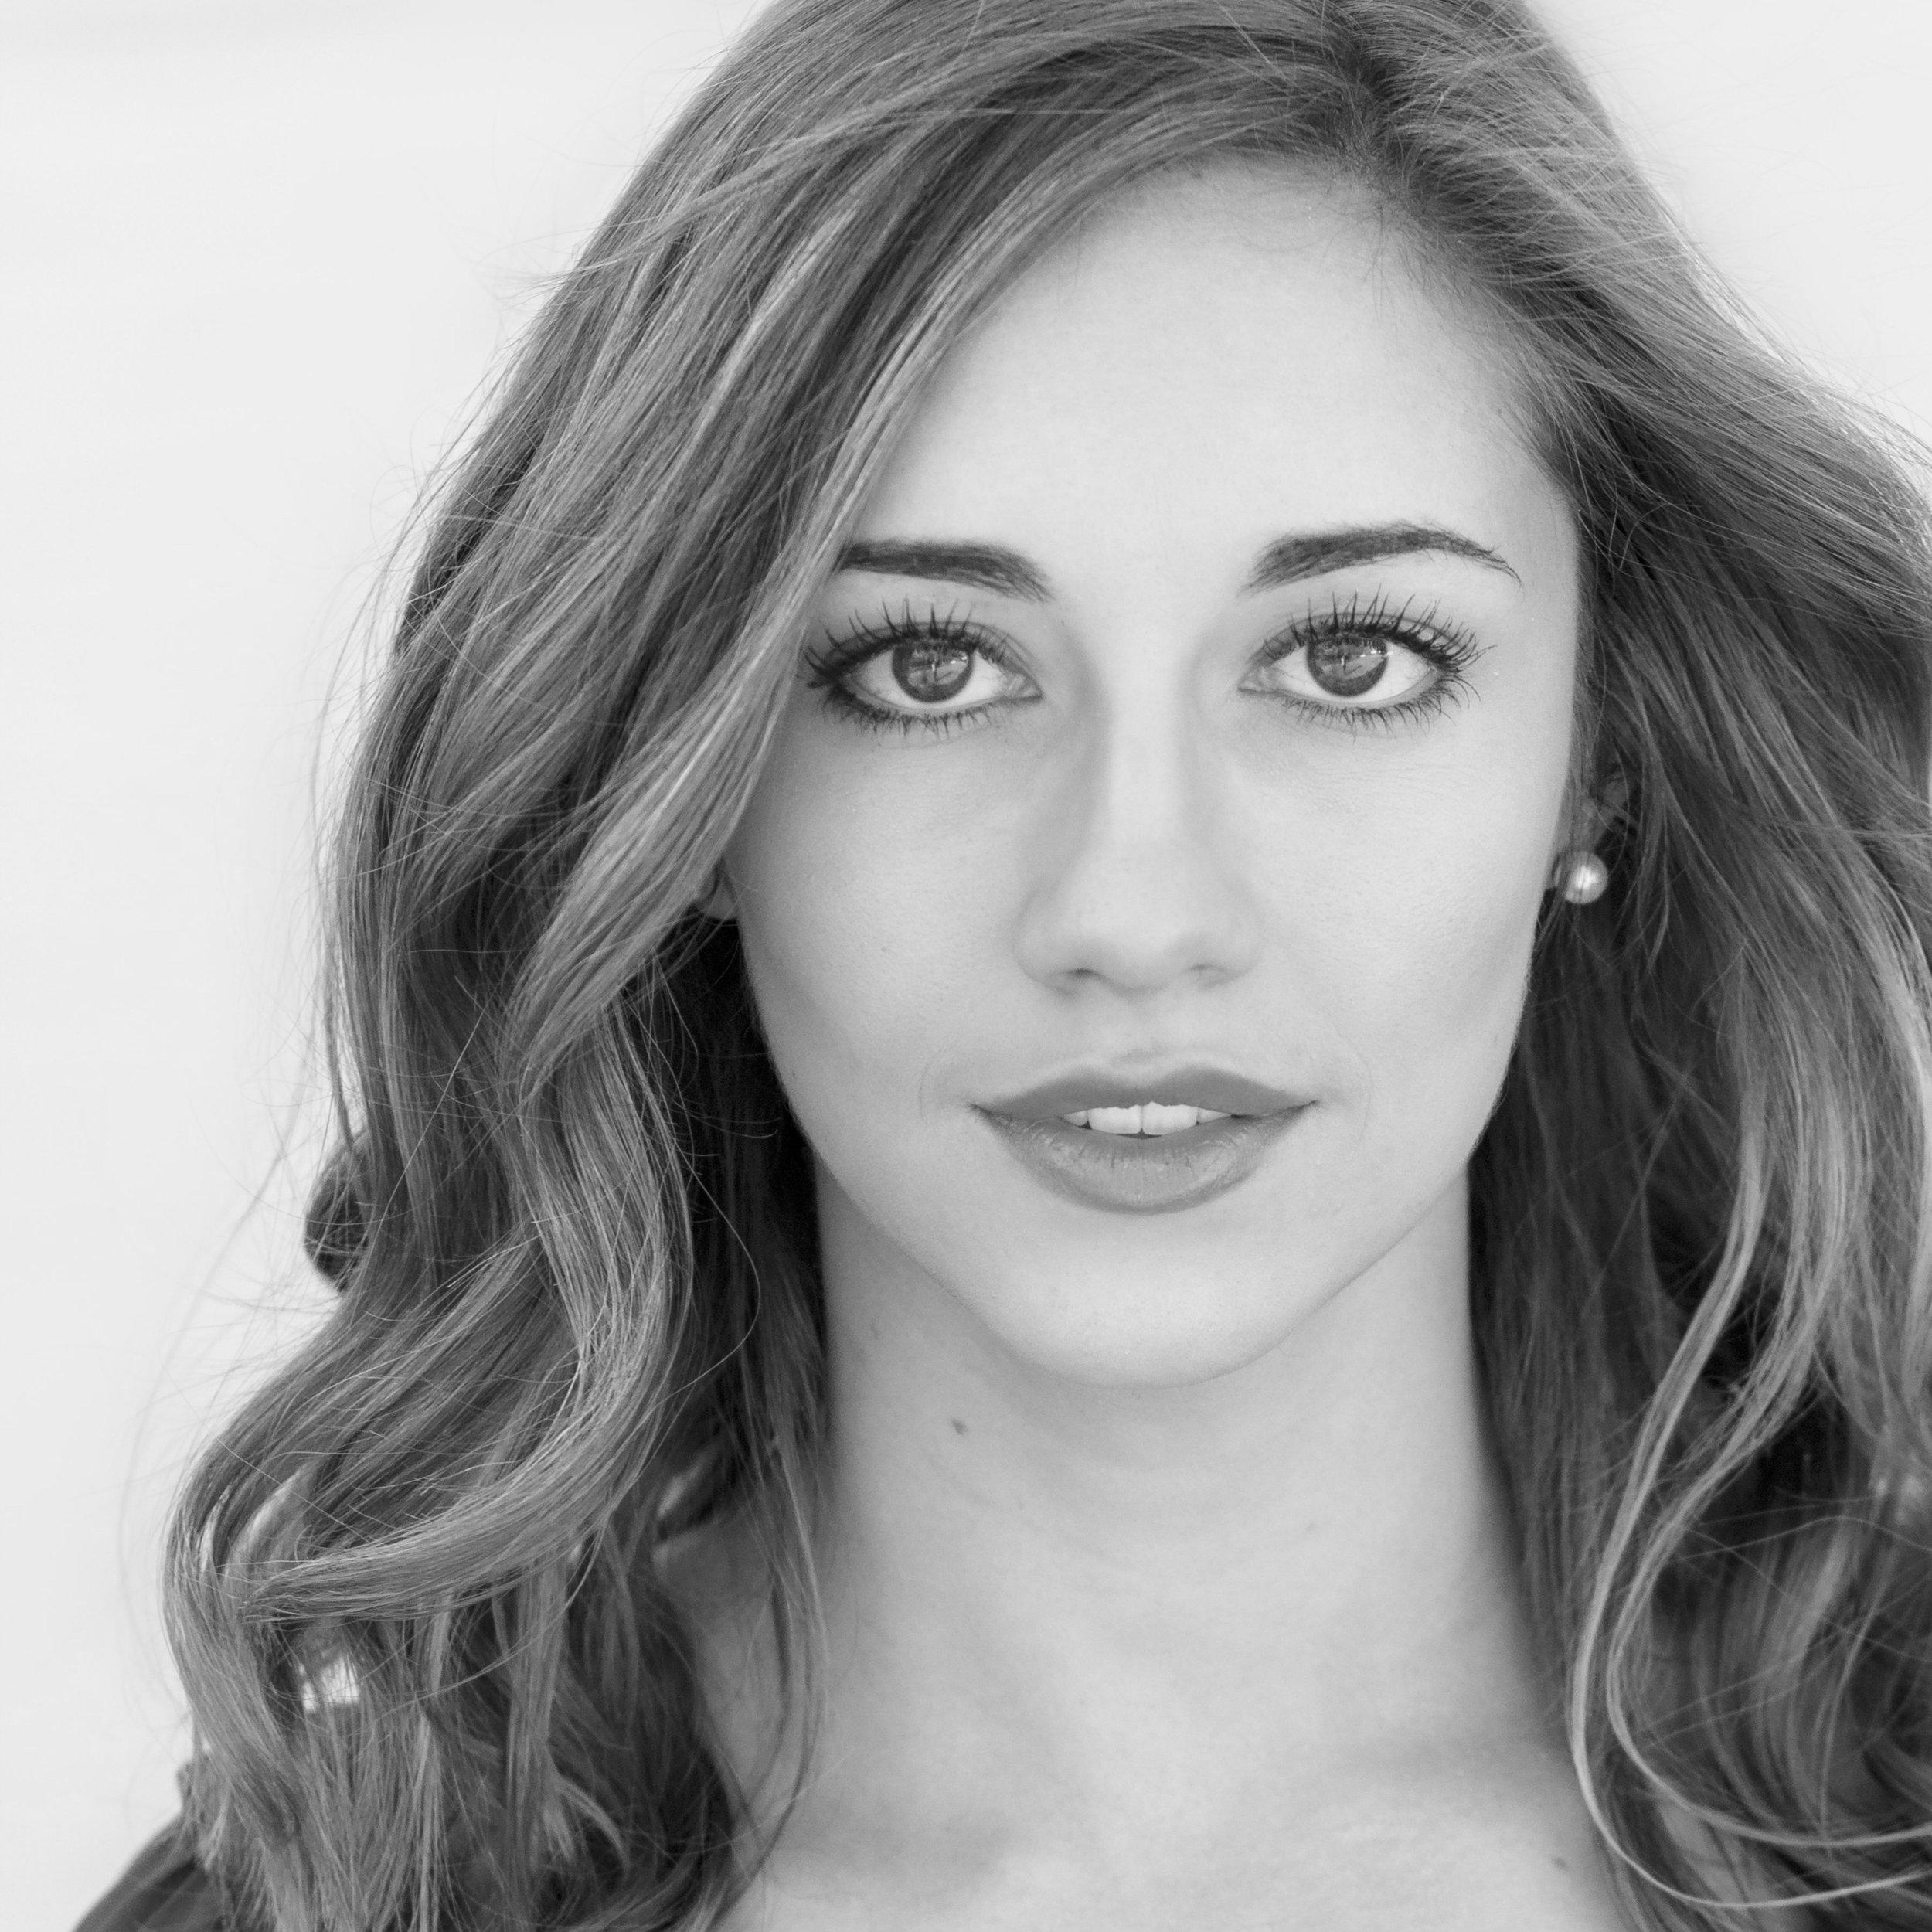 Anna Williford / Actor (Reba)